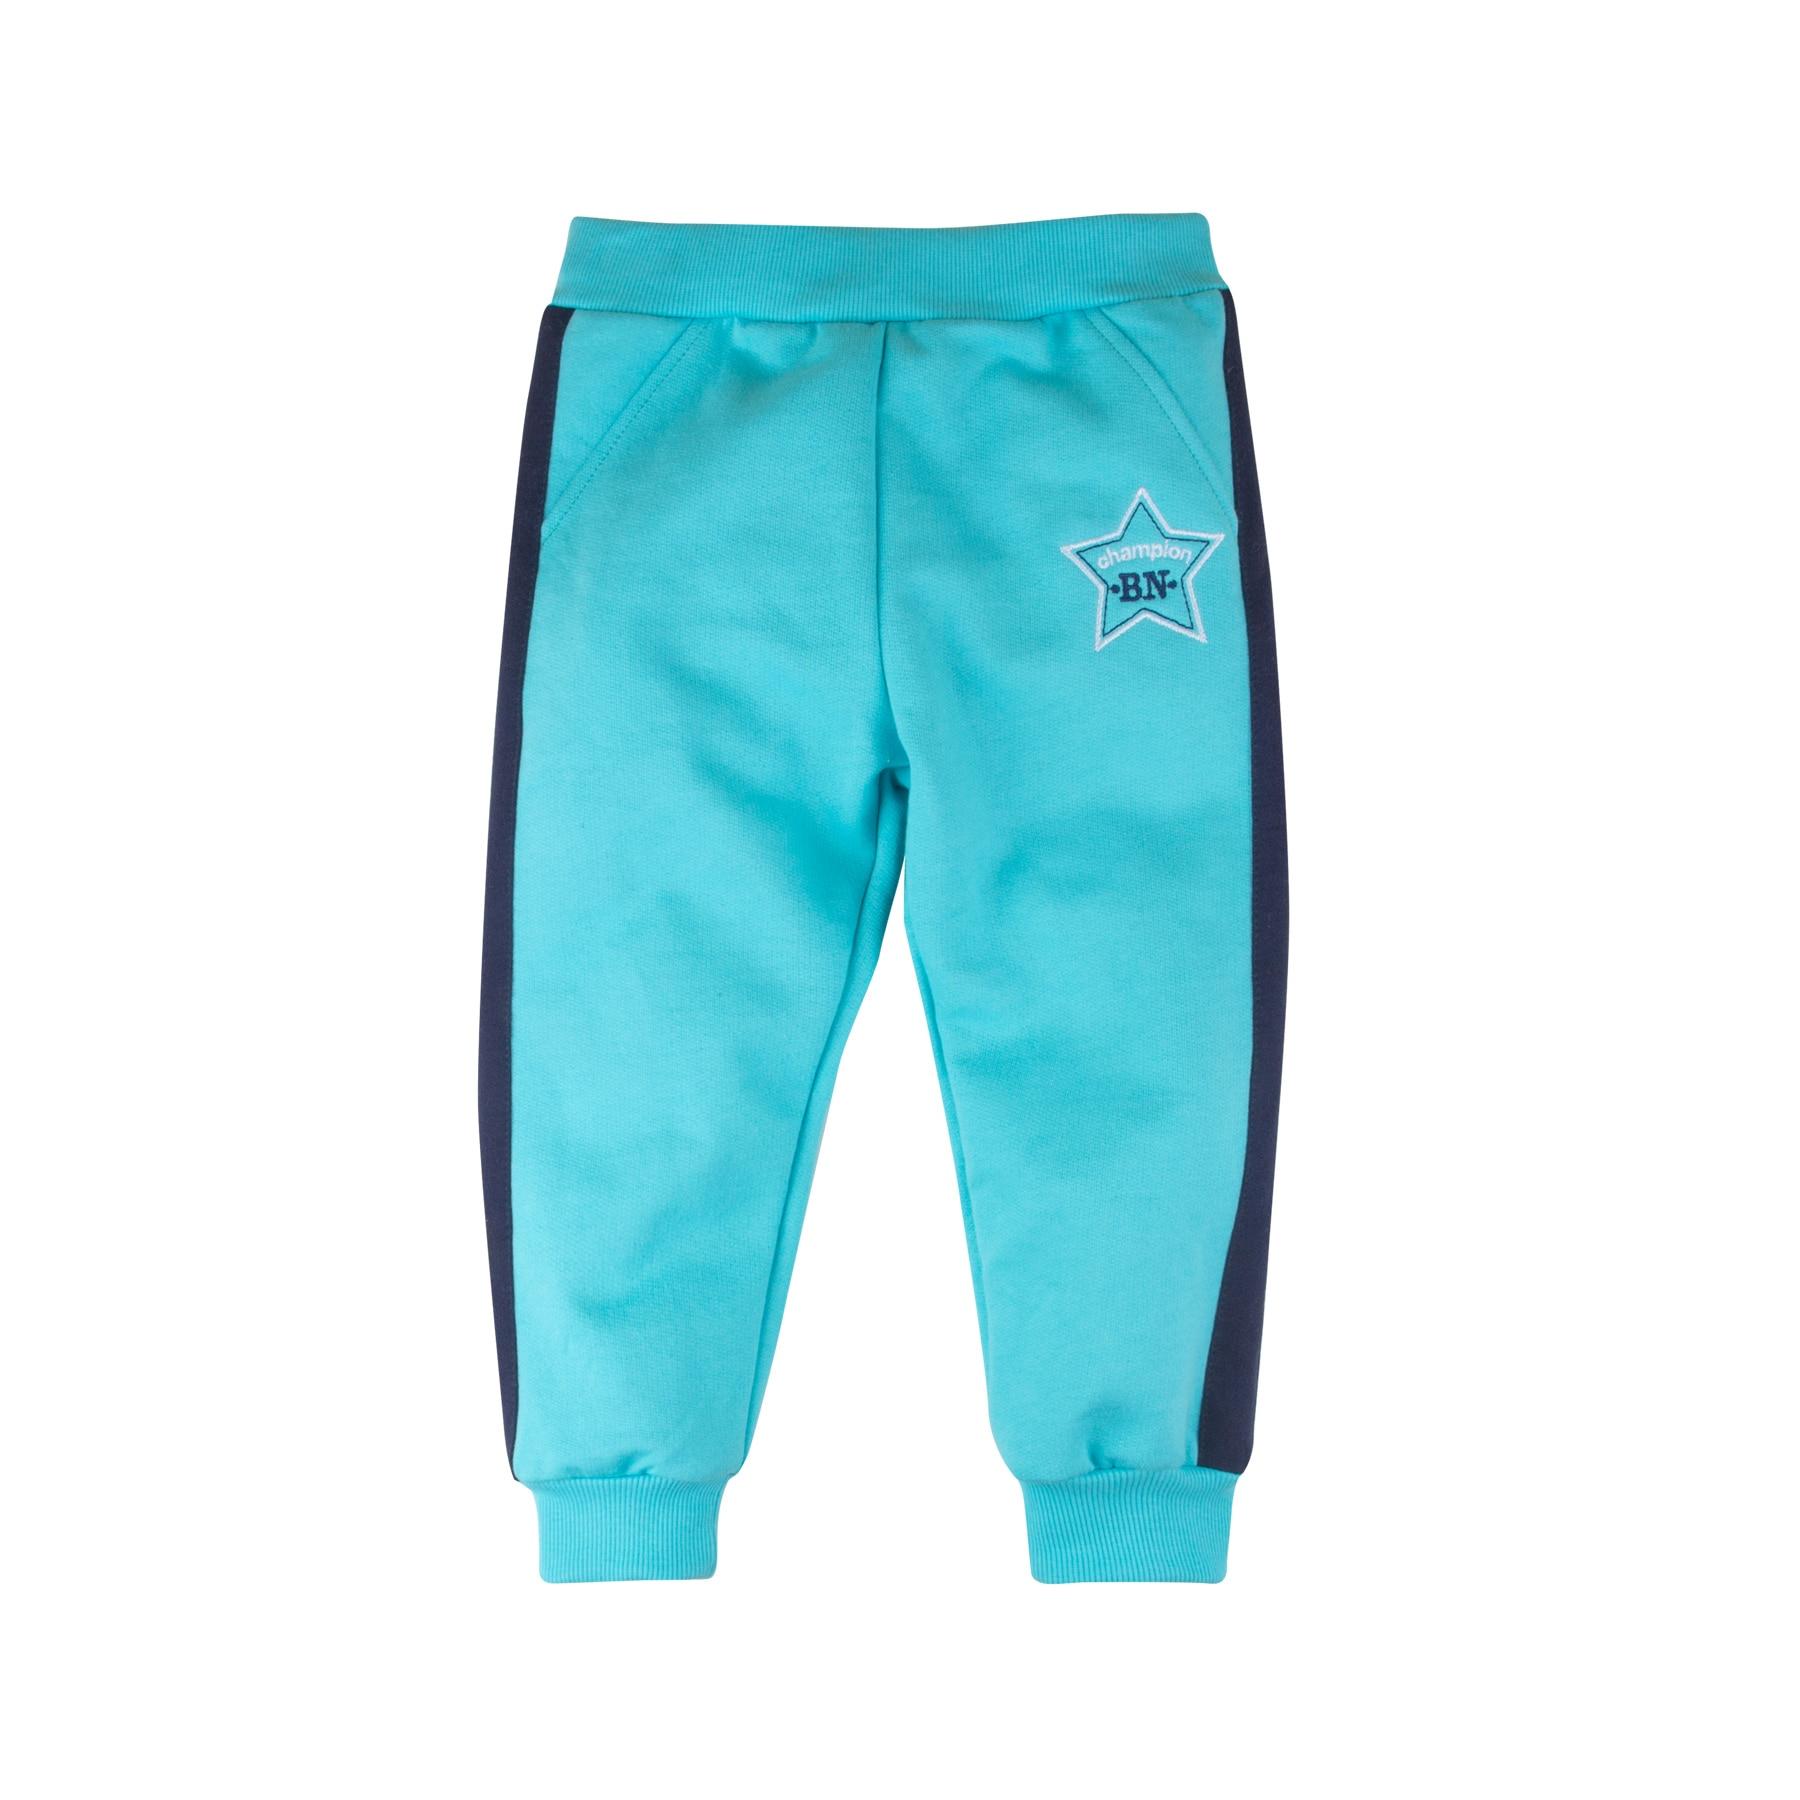 Pants for girls BOSSA NOVA 480B-462b kid clothes pants for girls bossa nova 487b 462b kid clothes